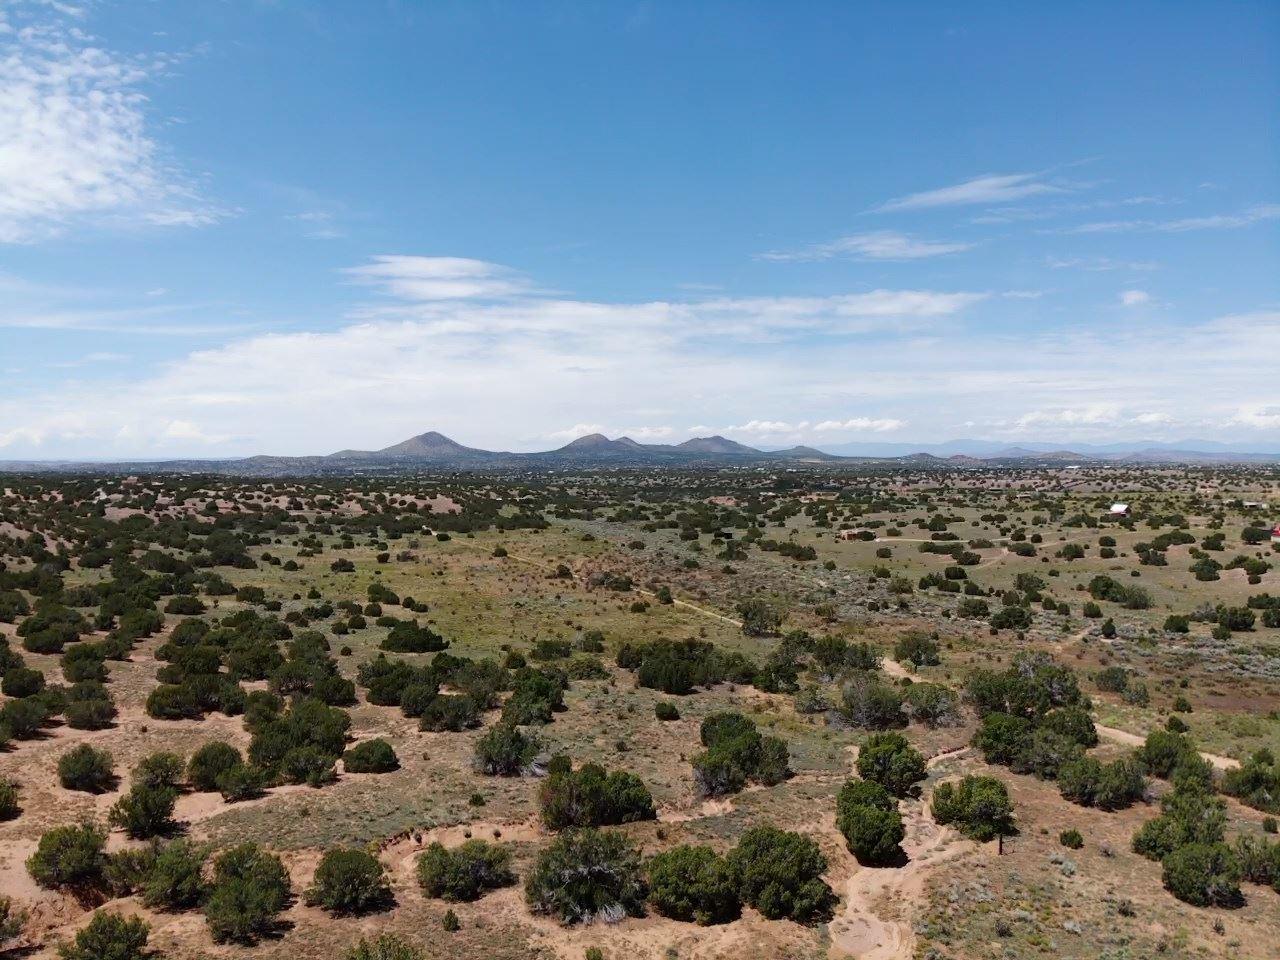 Photo for 0 Haozous Rd Lot 1, Santa Fe, NM 87508 (MLS # 201903712)